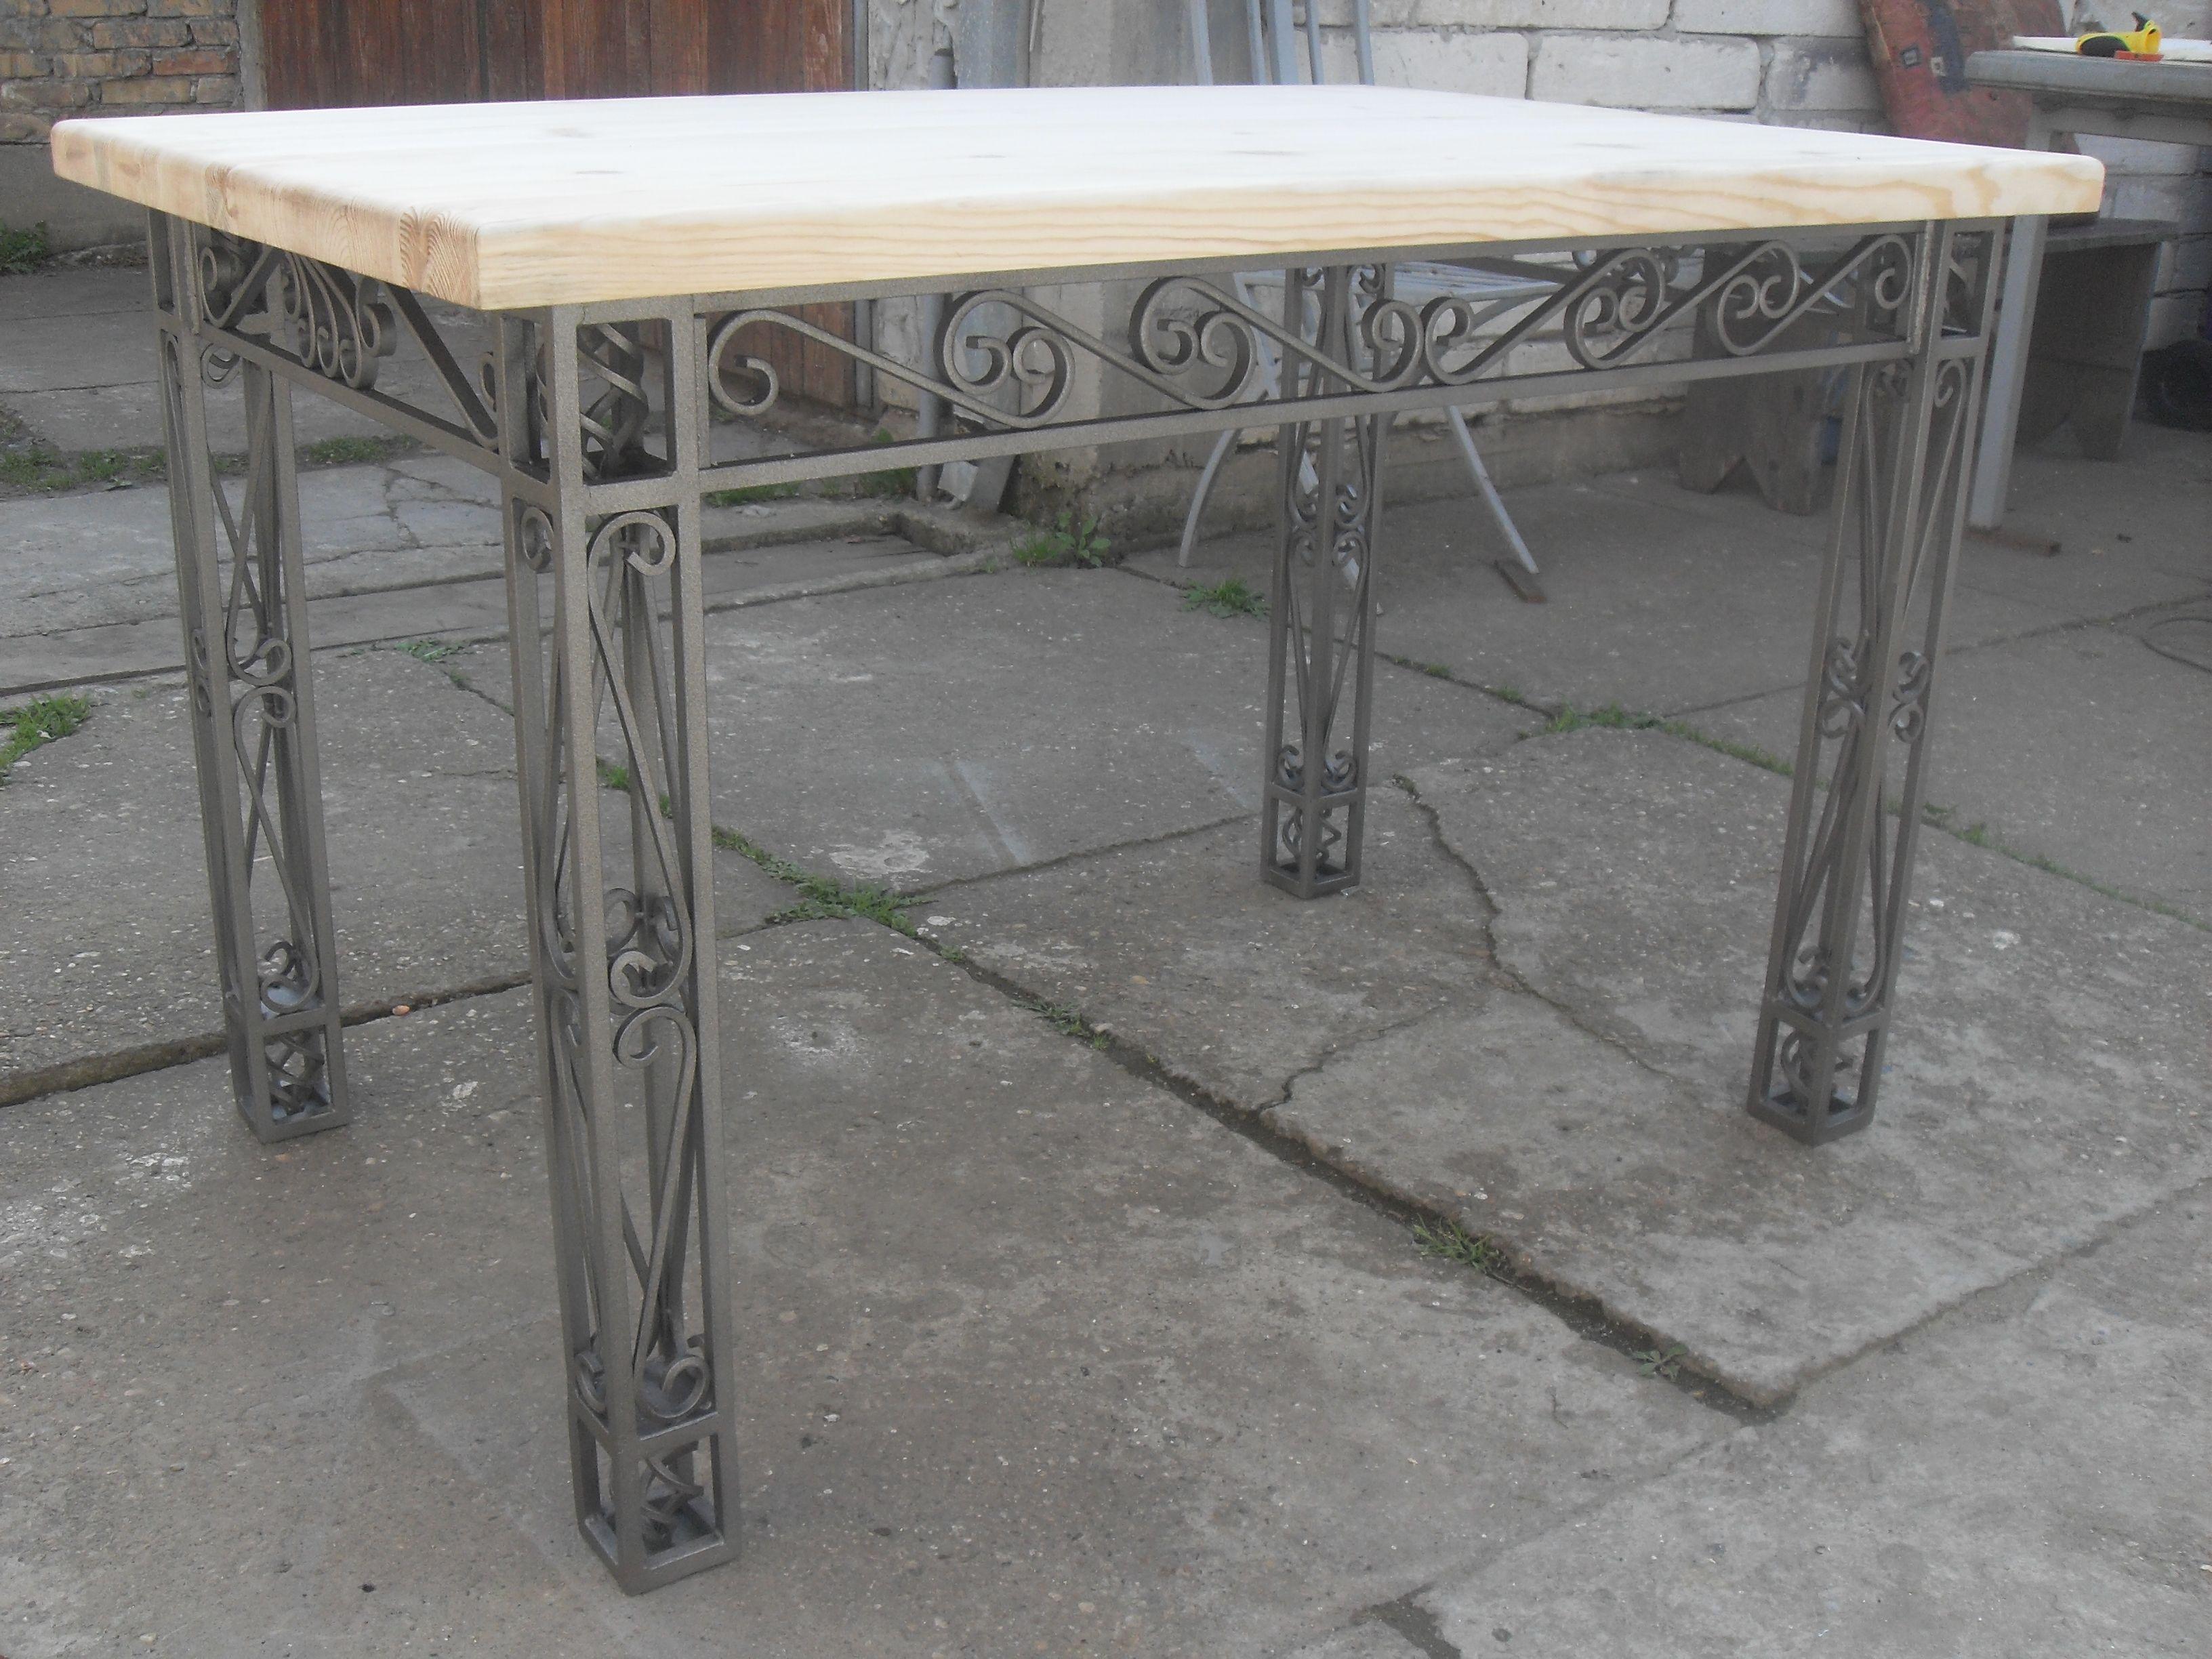 03179782a50d4253f9bdb883d12898b9 Frais De Table De Jardin Metal Schème